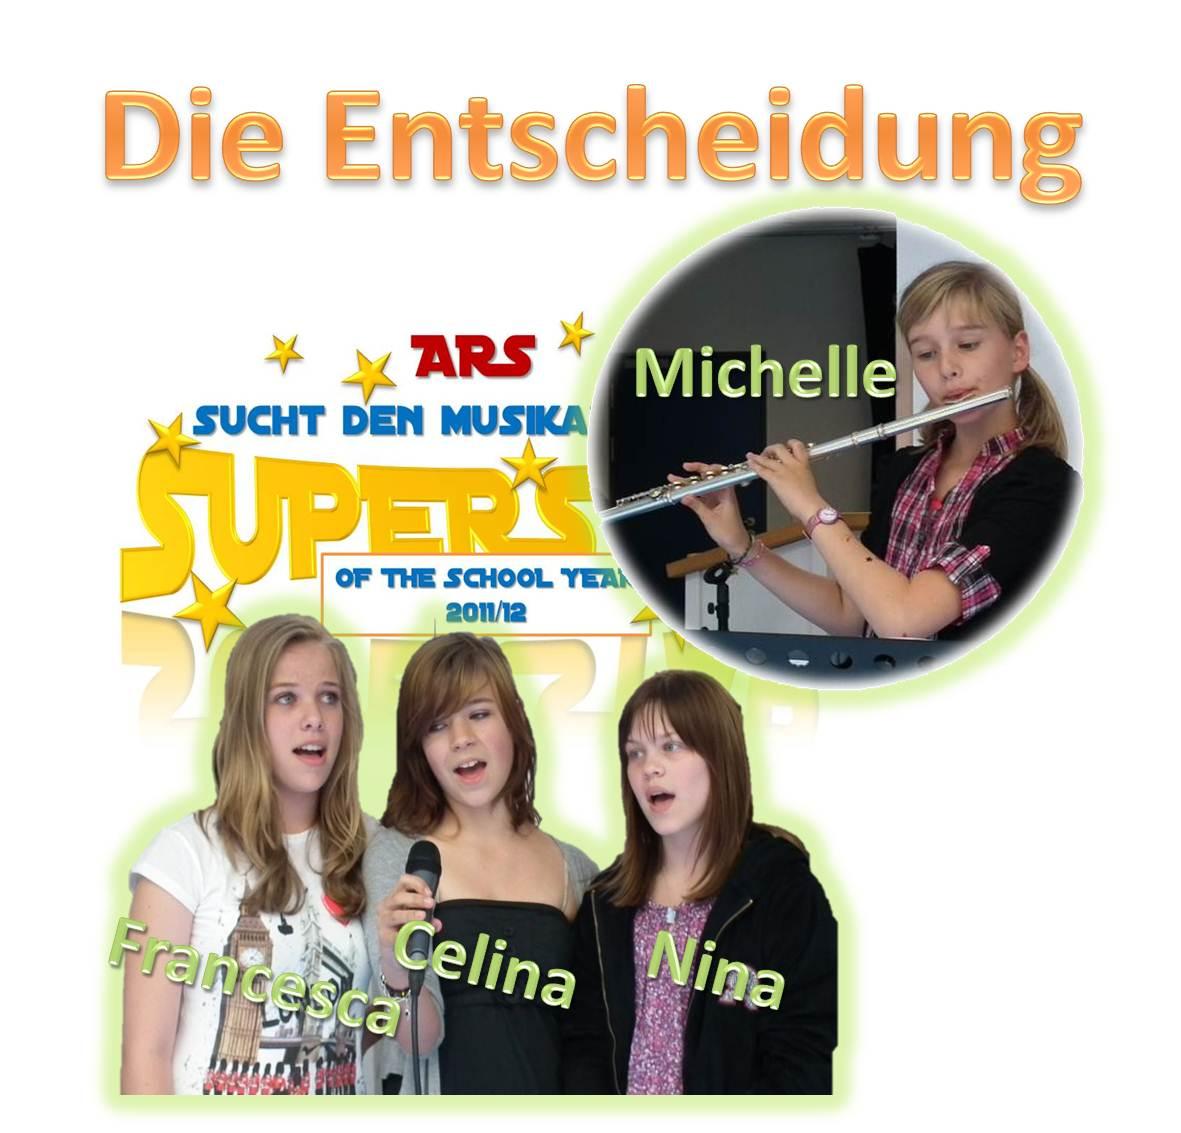 ARS Superstar 2012